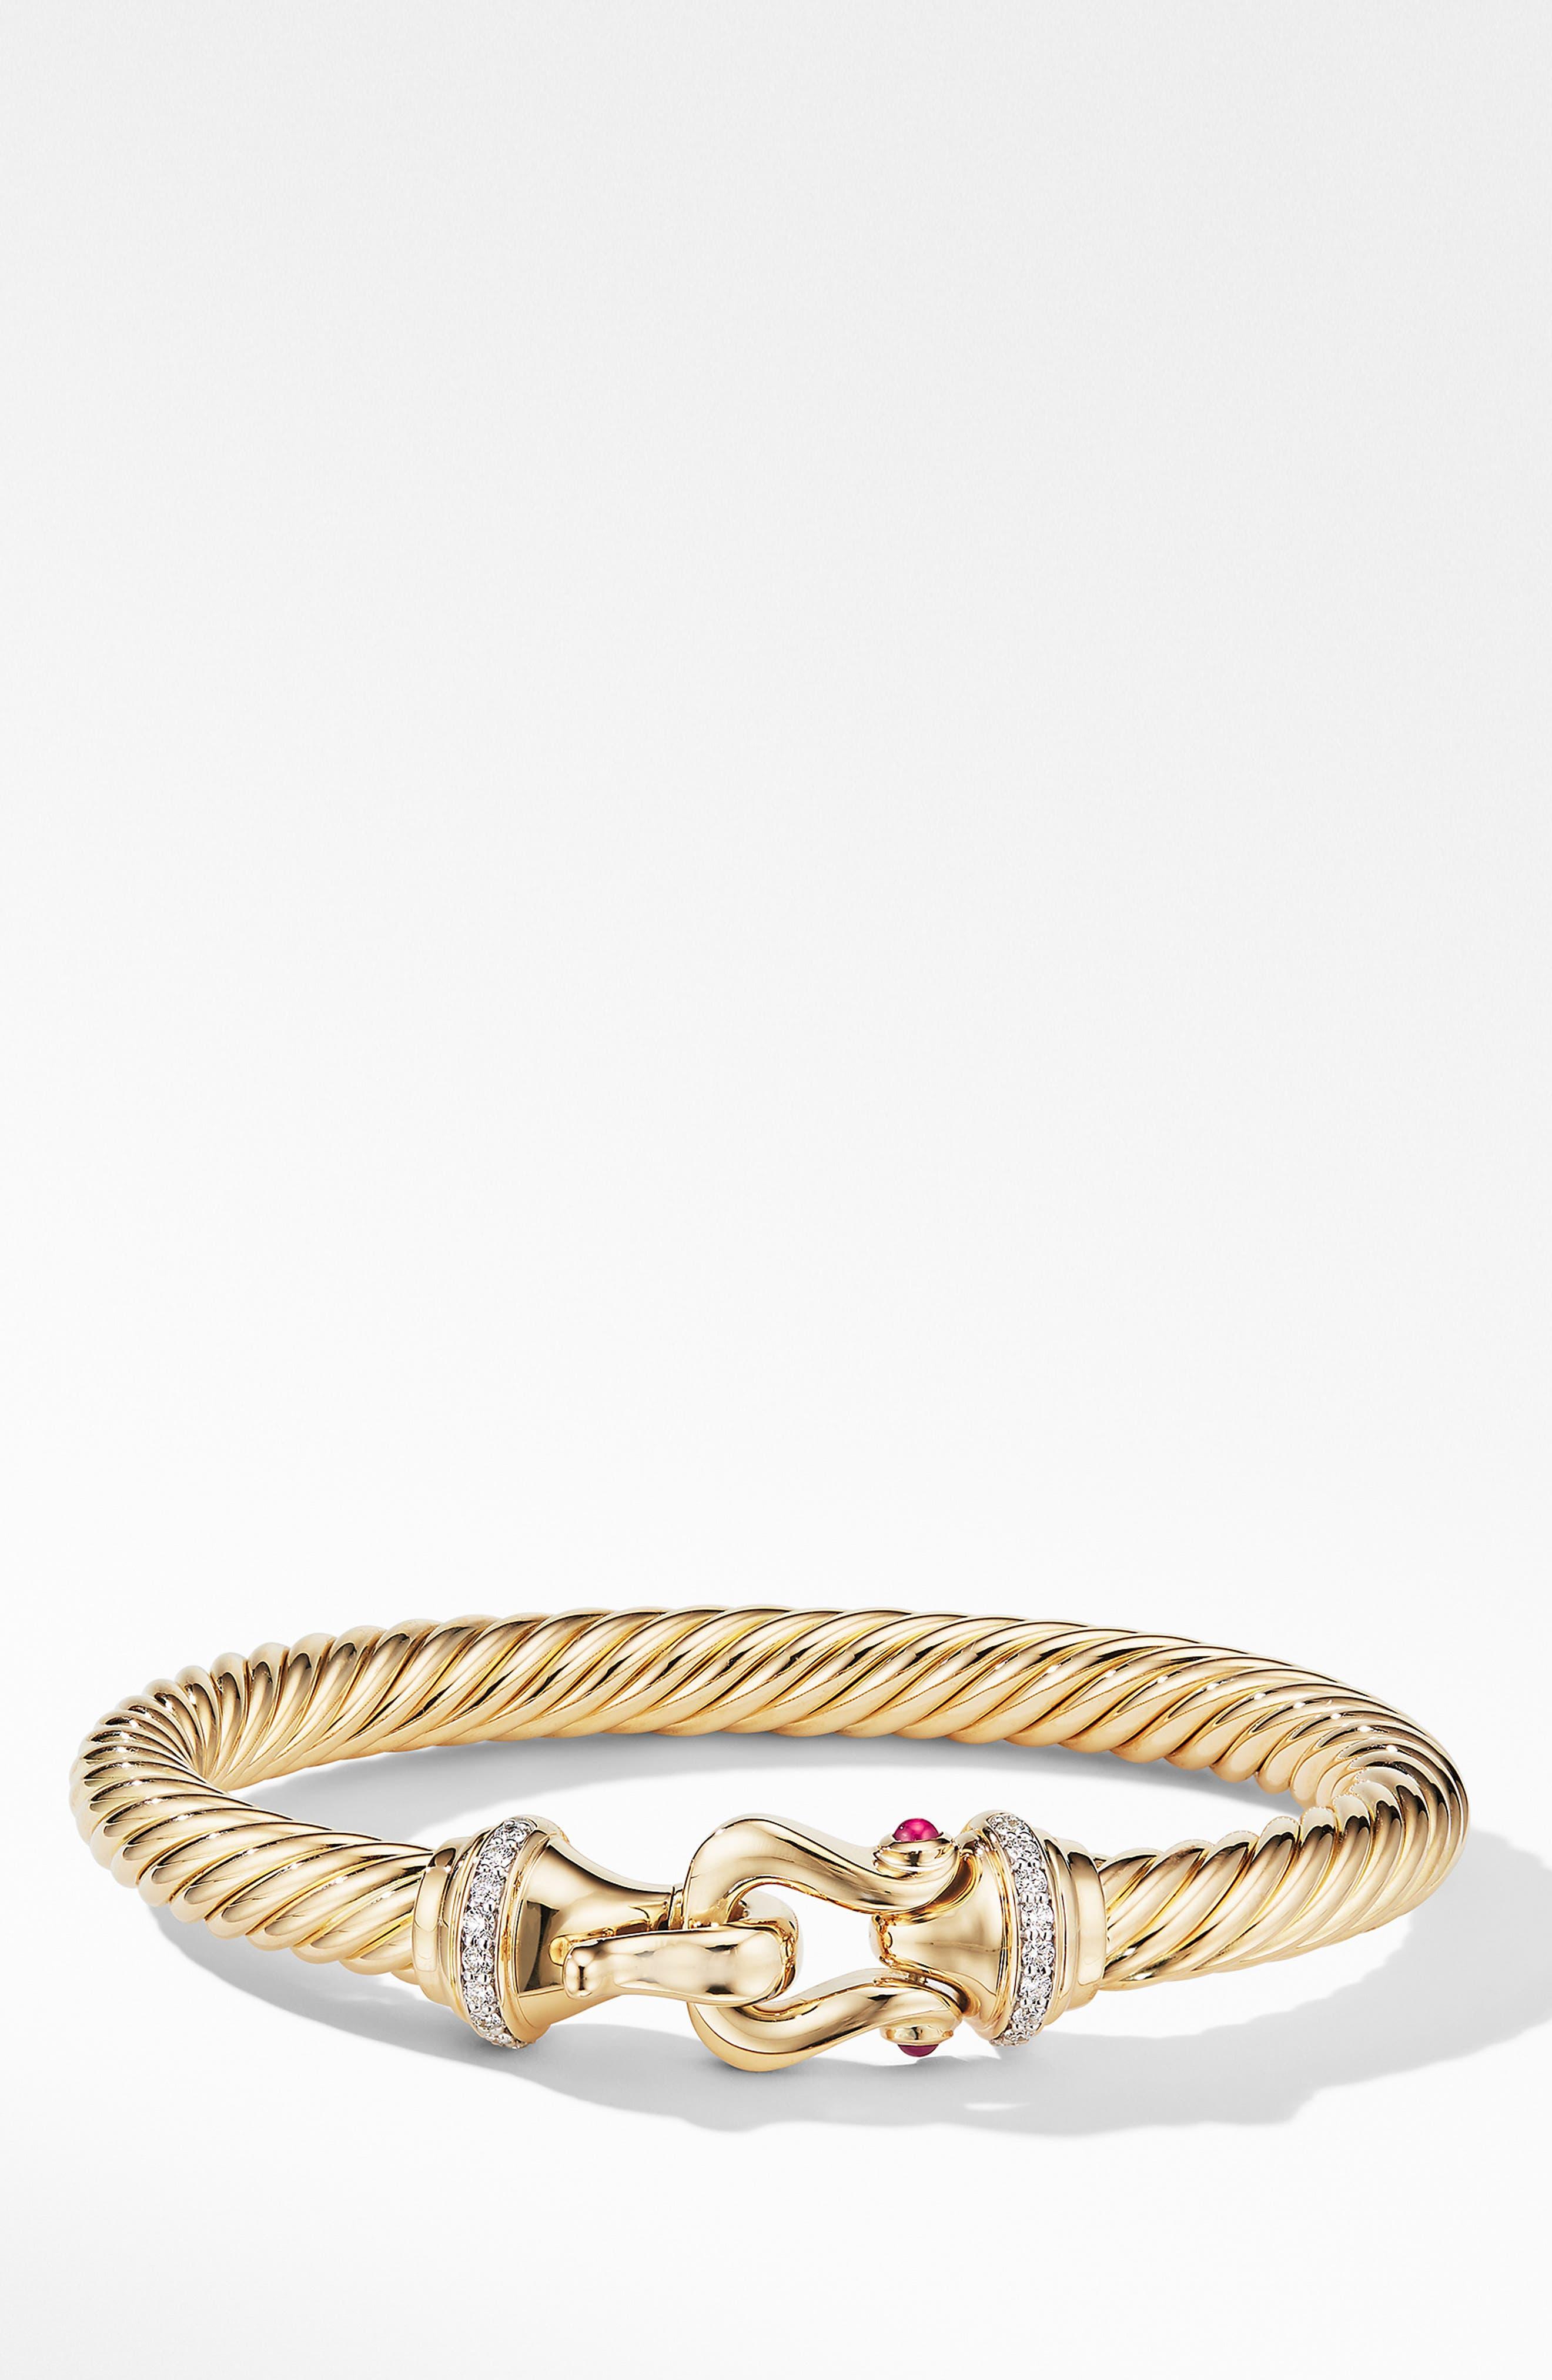 DAVID YURMAN Cable Buckle Bracelet with Diamonds, Main, color, GOLD/ RUBY/ DIAMOND